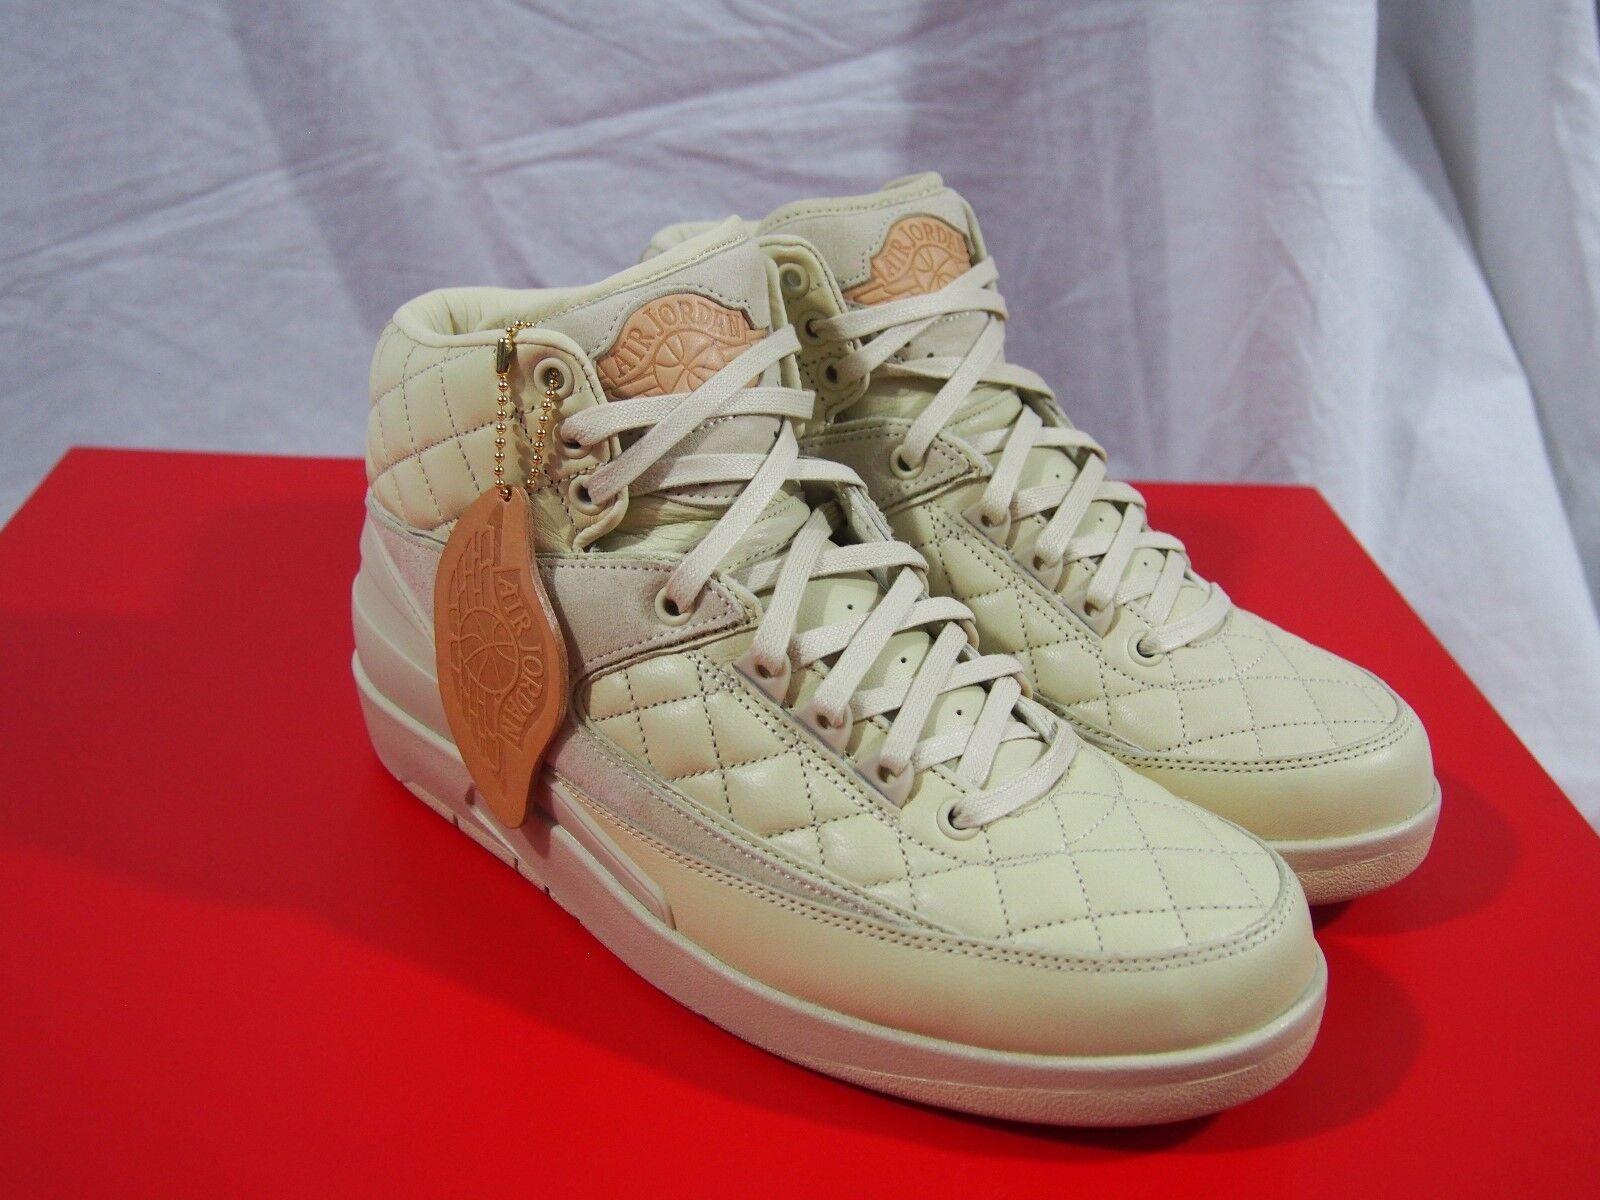 Nike Air Jordan 2 Don C Beach size 8 US